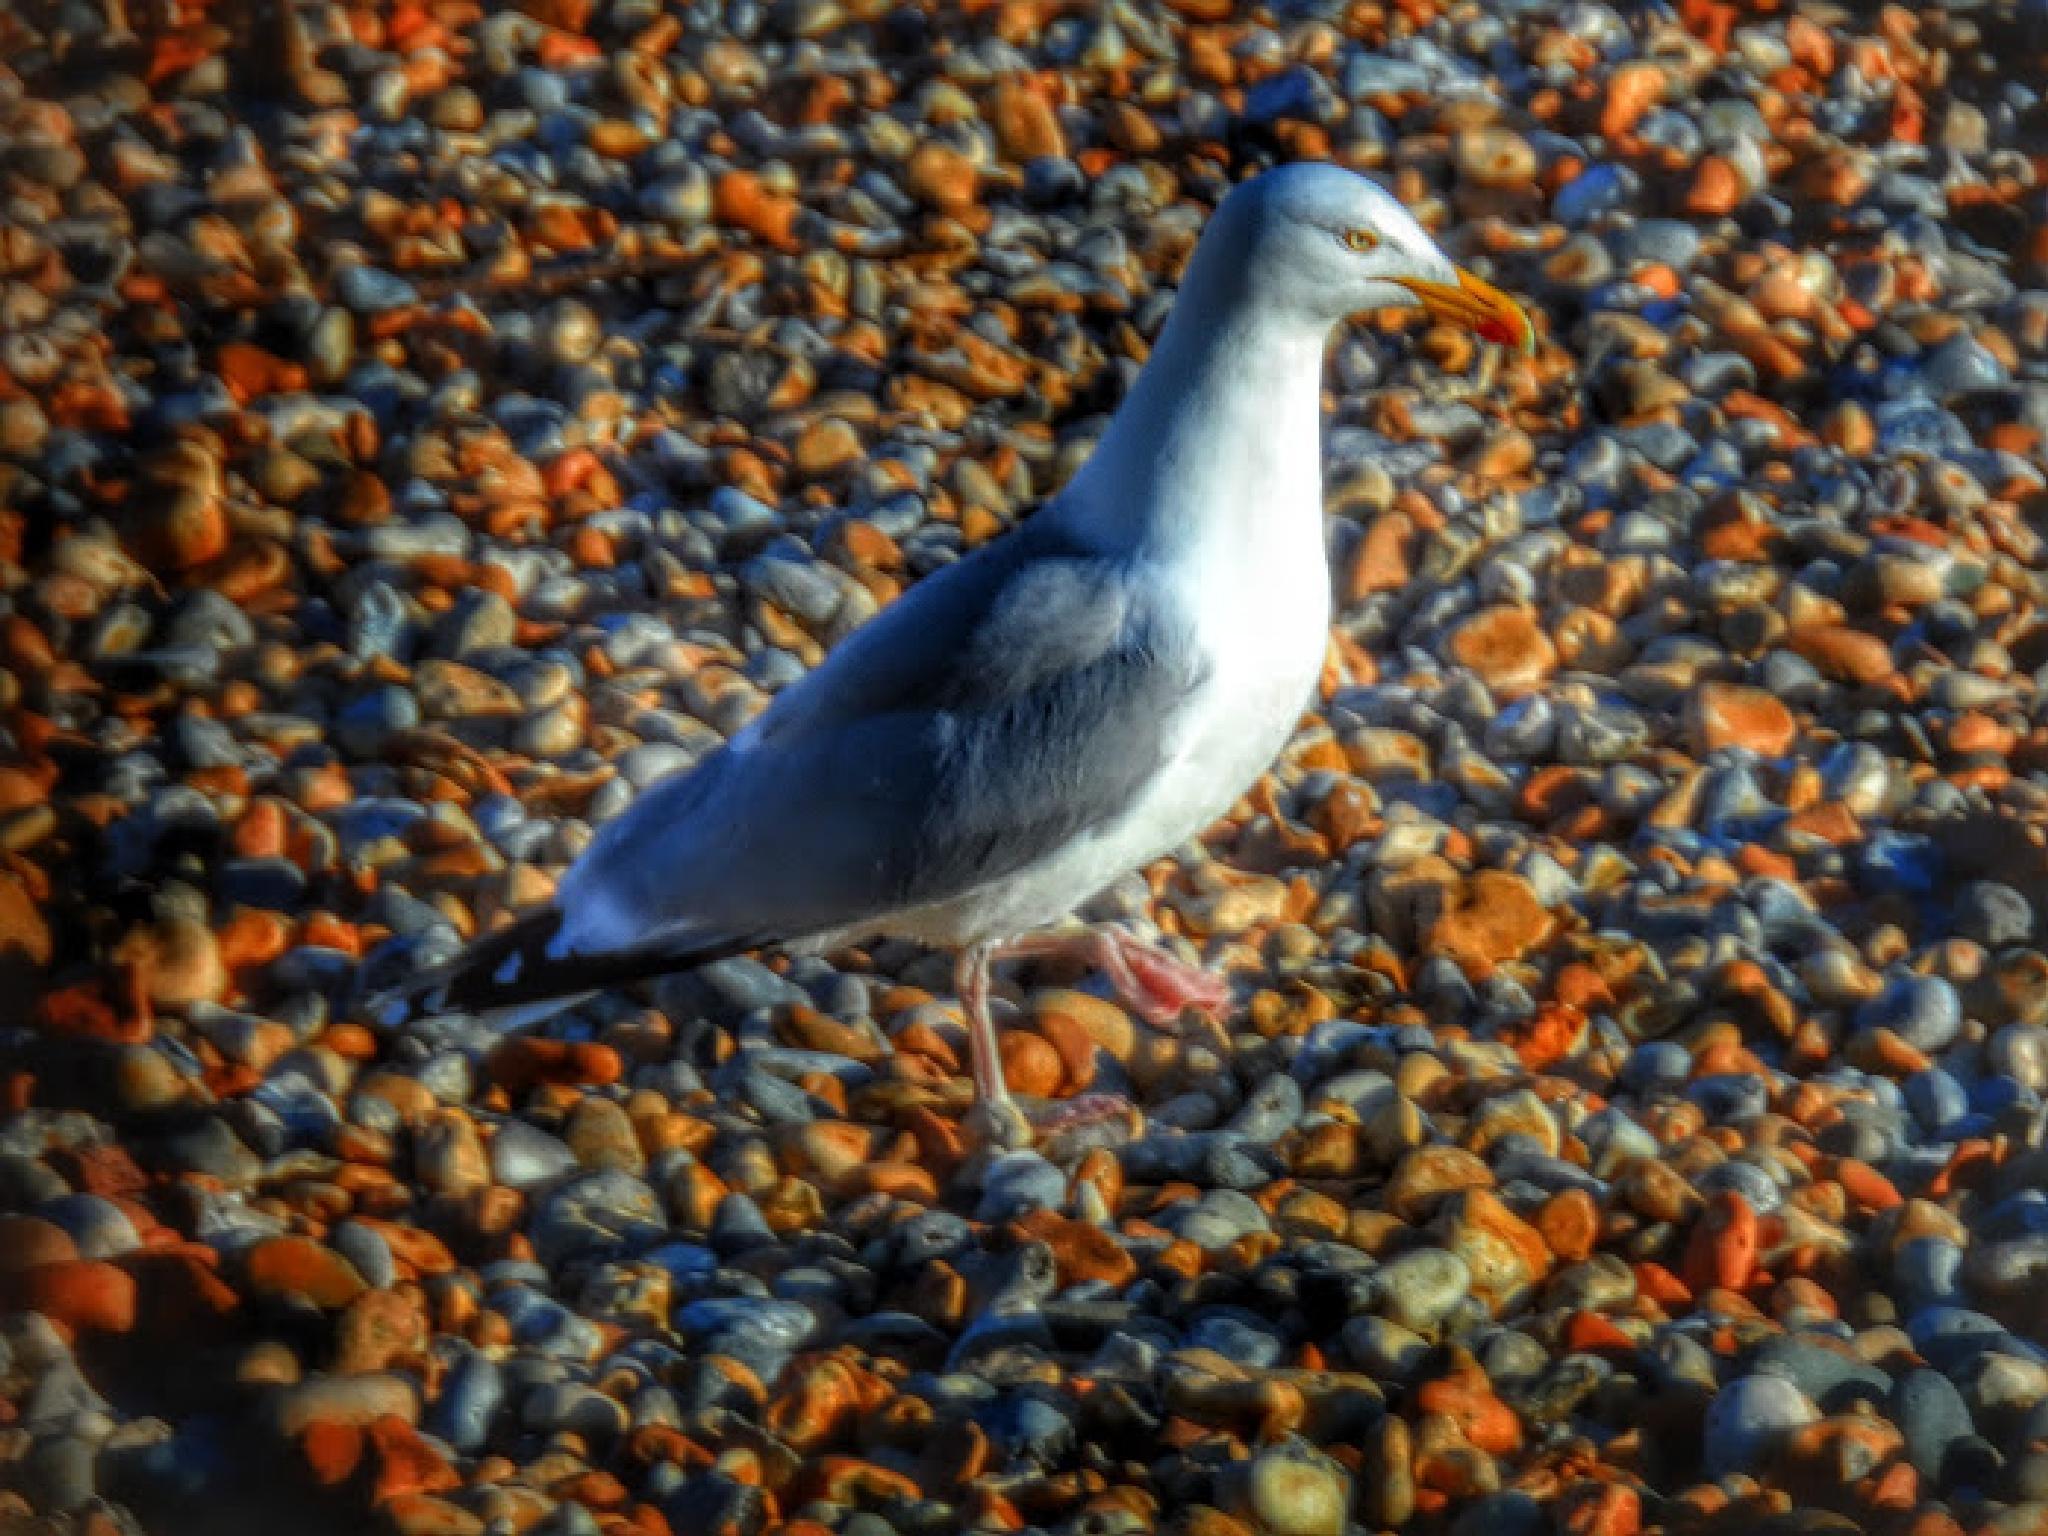 Gull by Jonathan Wood